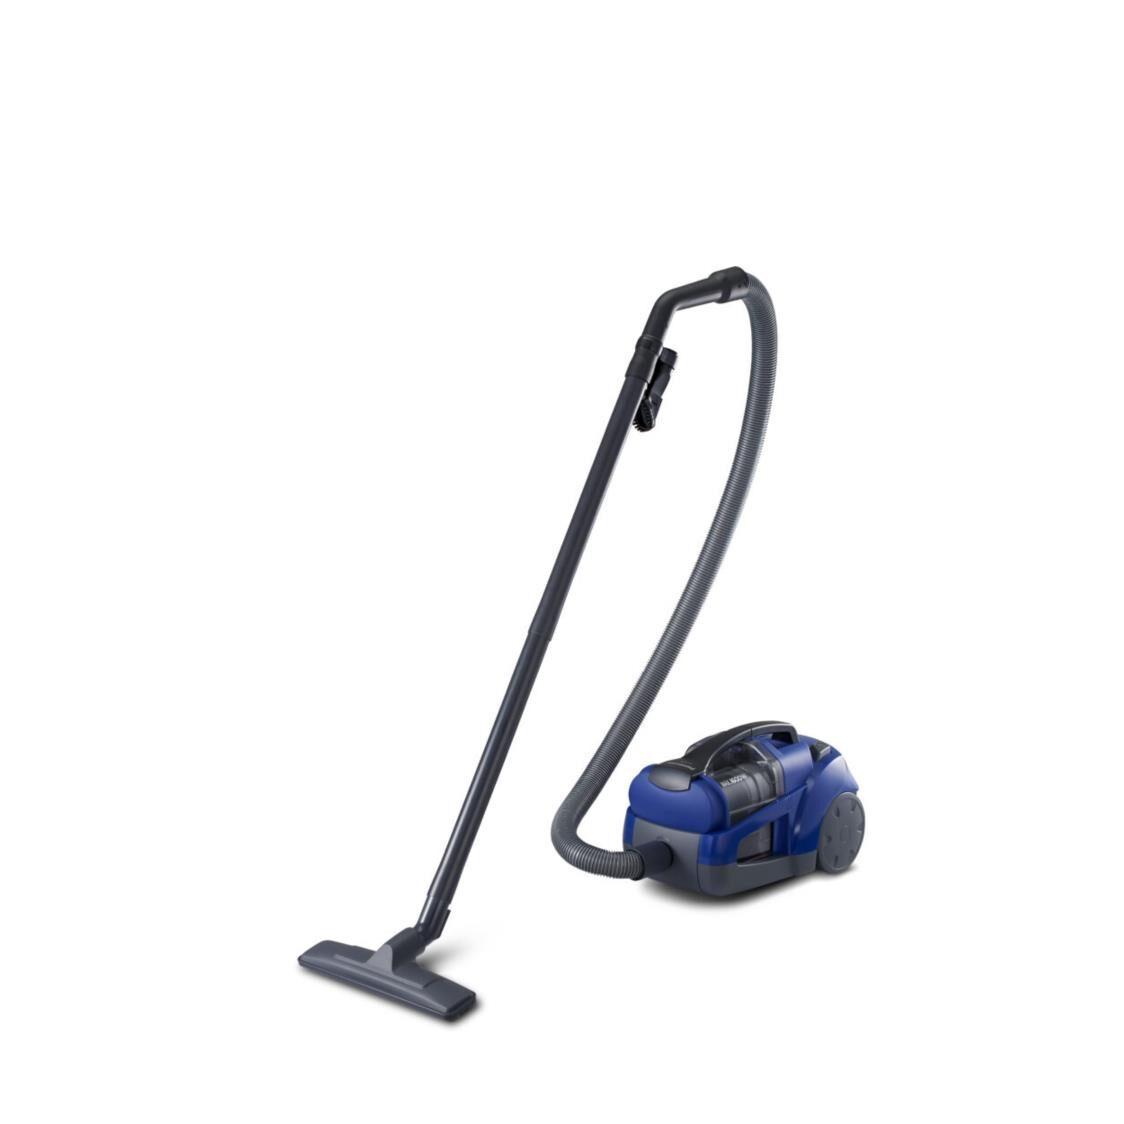 Panasonic Bagless Power Suction Vacuum Cleaner MC-CL561